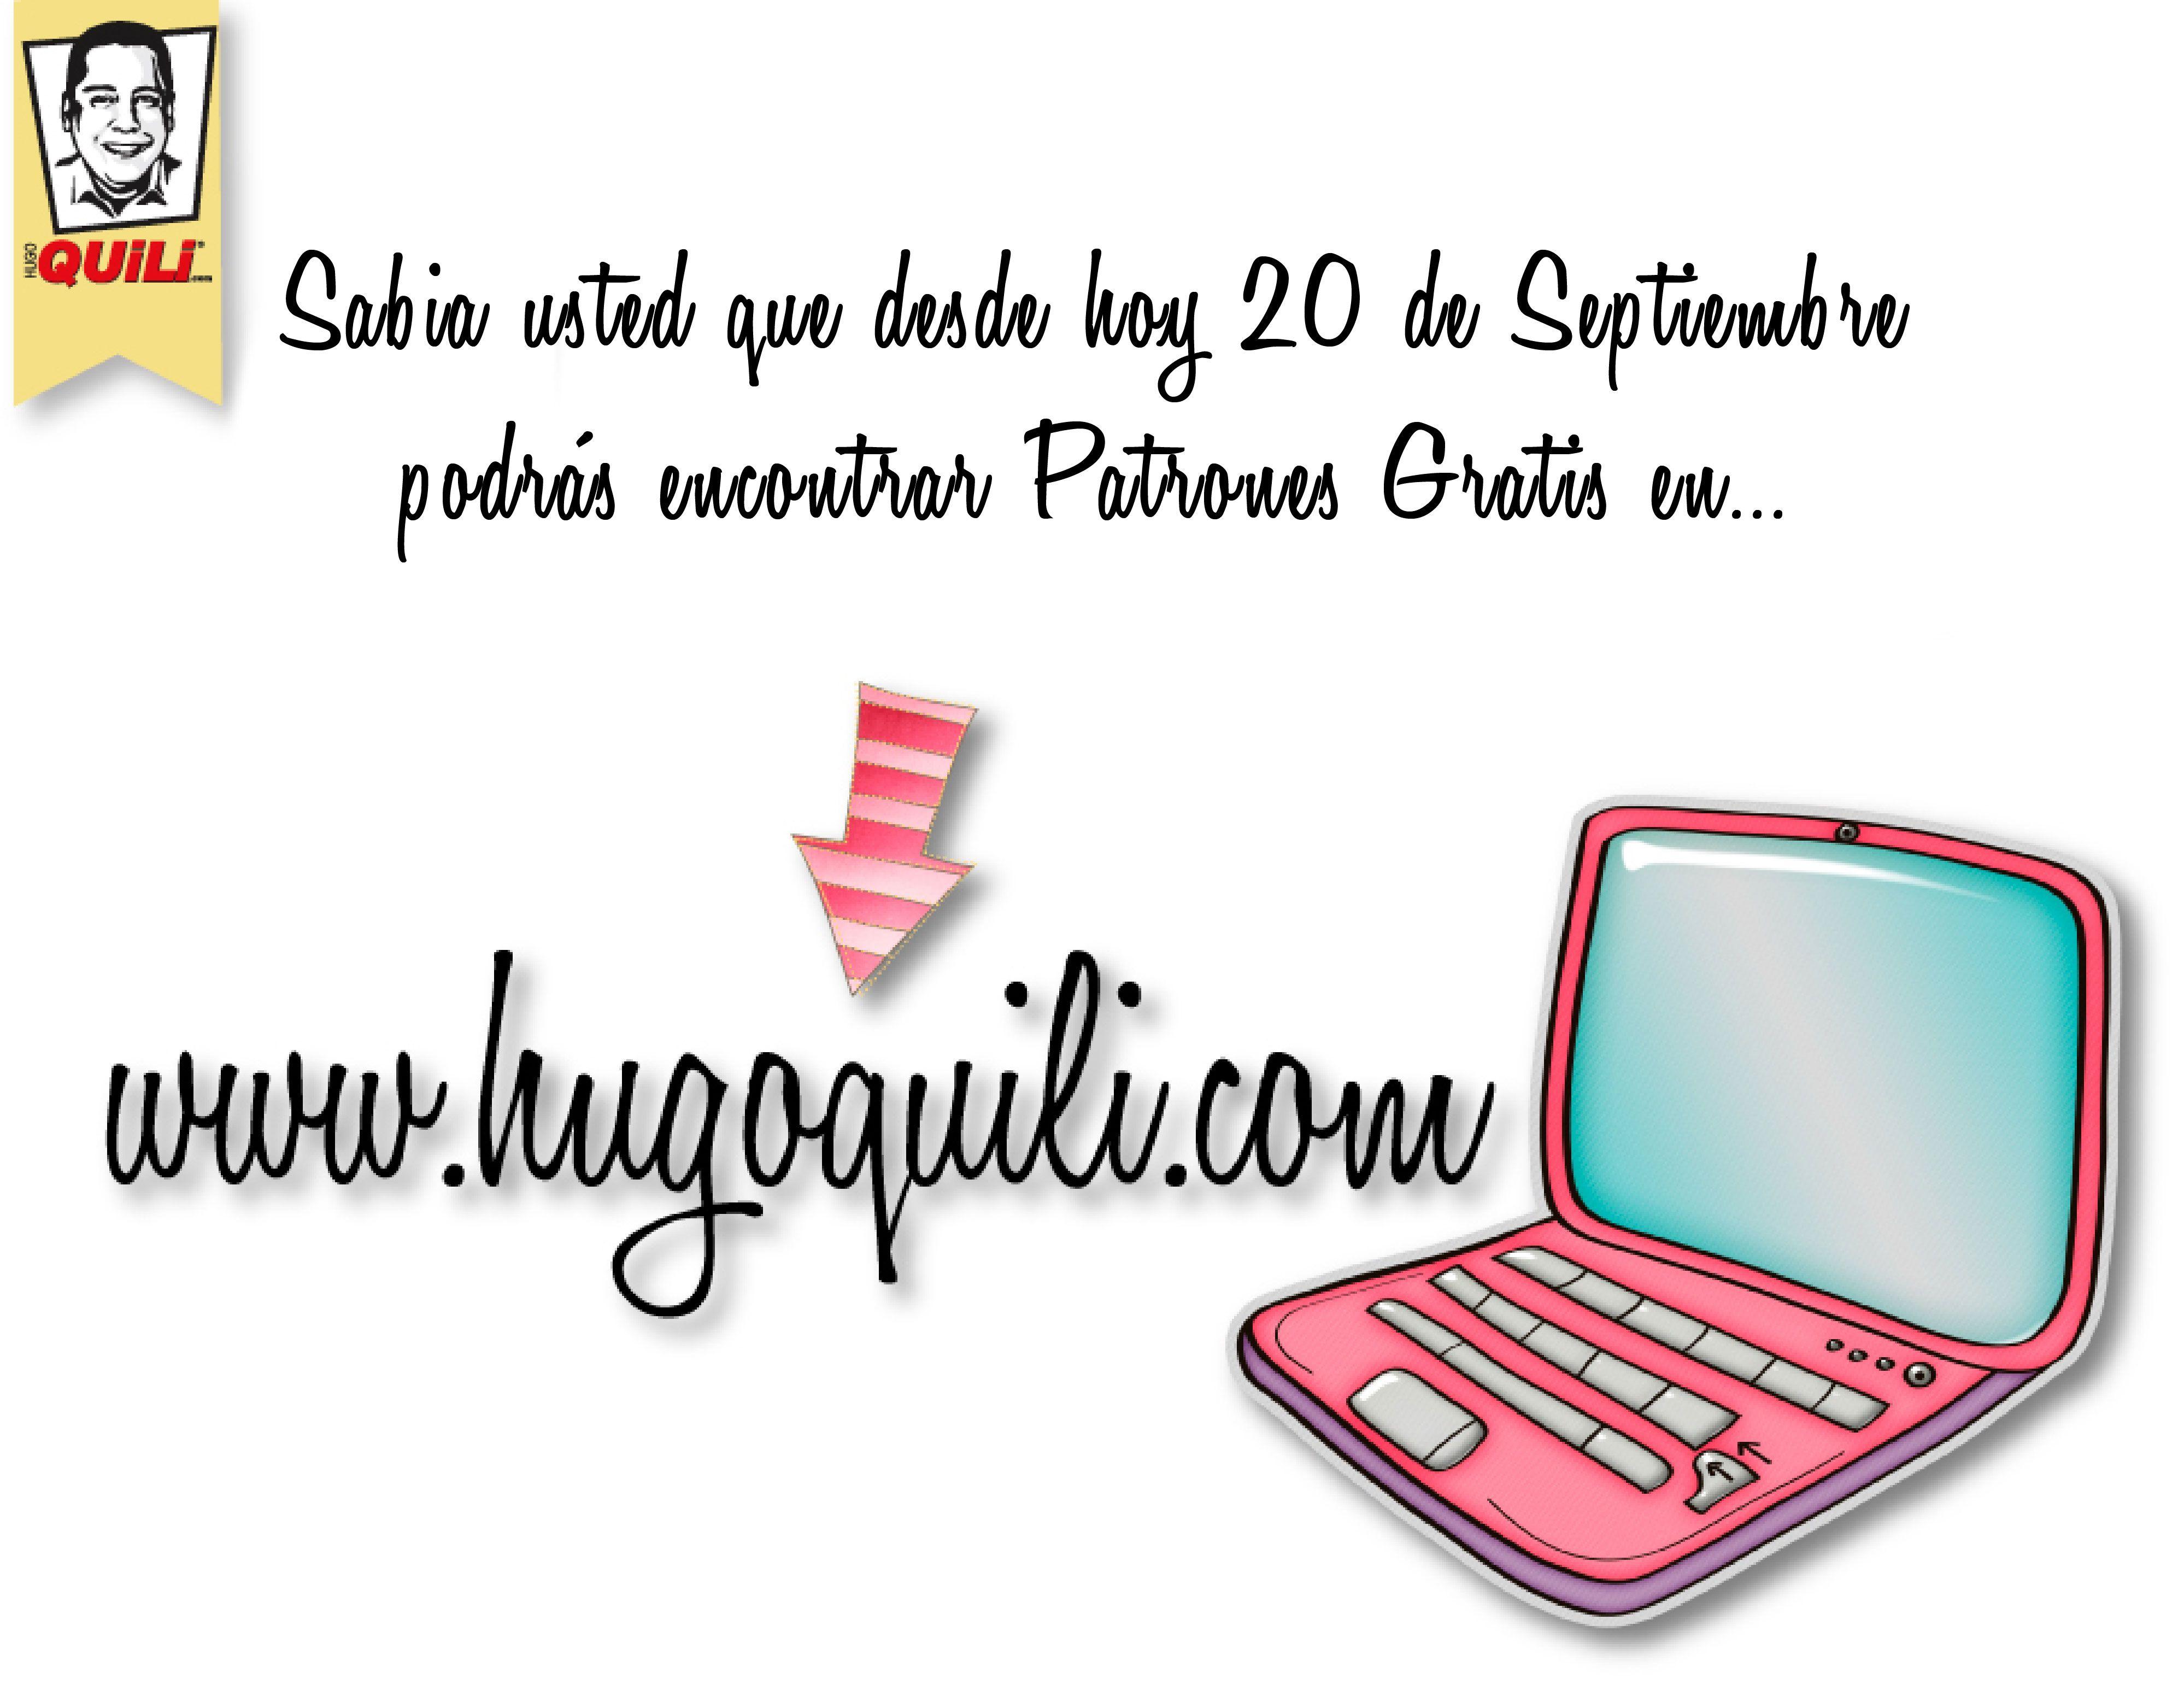 Patrones Gratis www.HugoQuili.com | manualidades | Pinterest ...